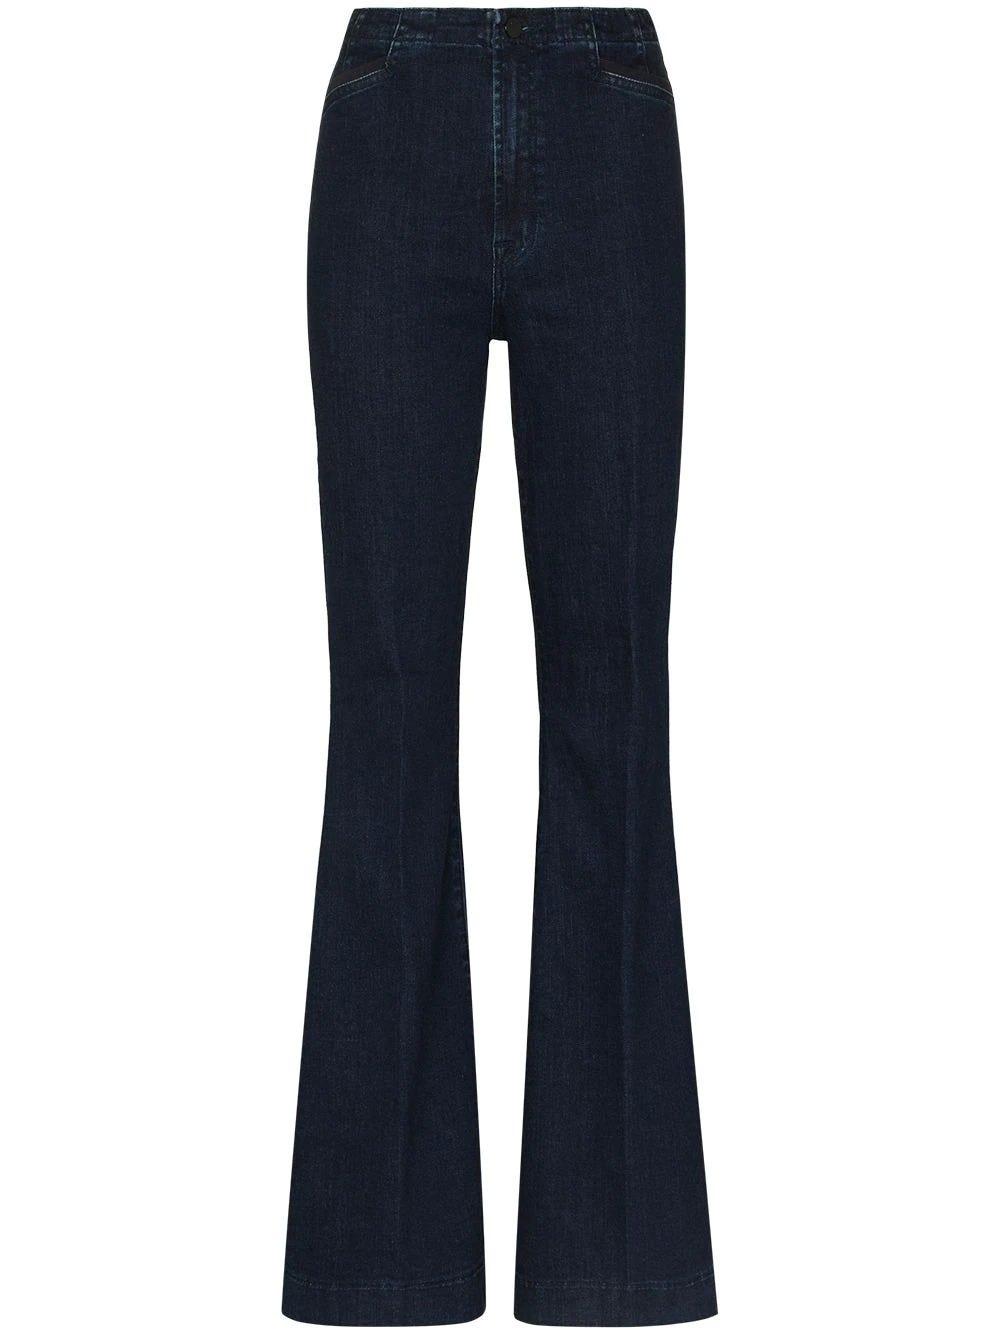 J Brand Dark Blue High Waisted Flared Jeans